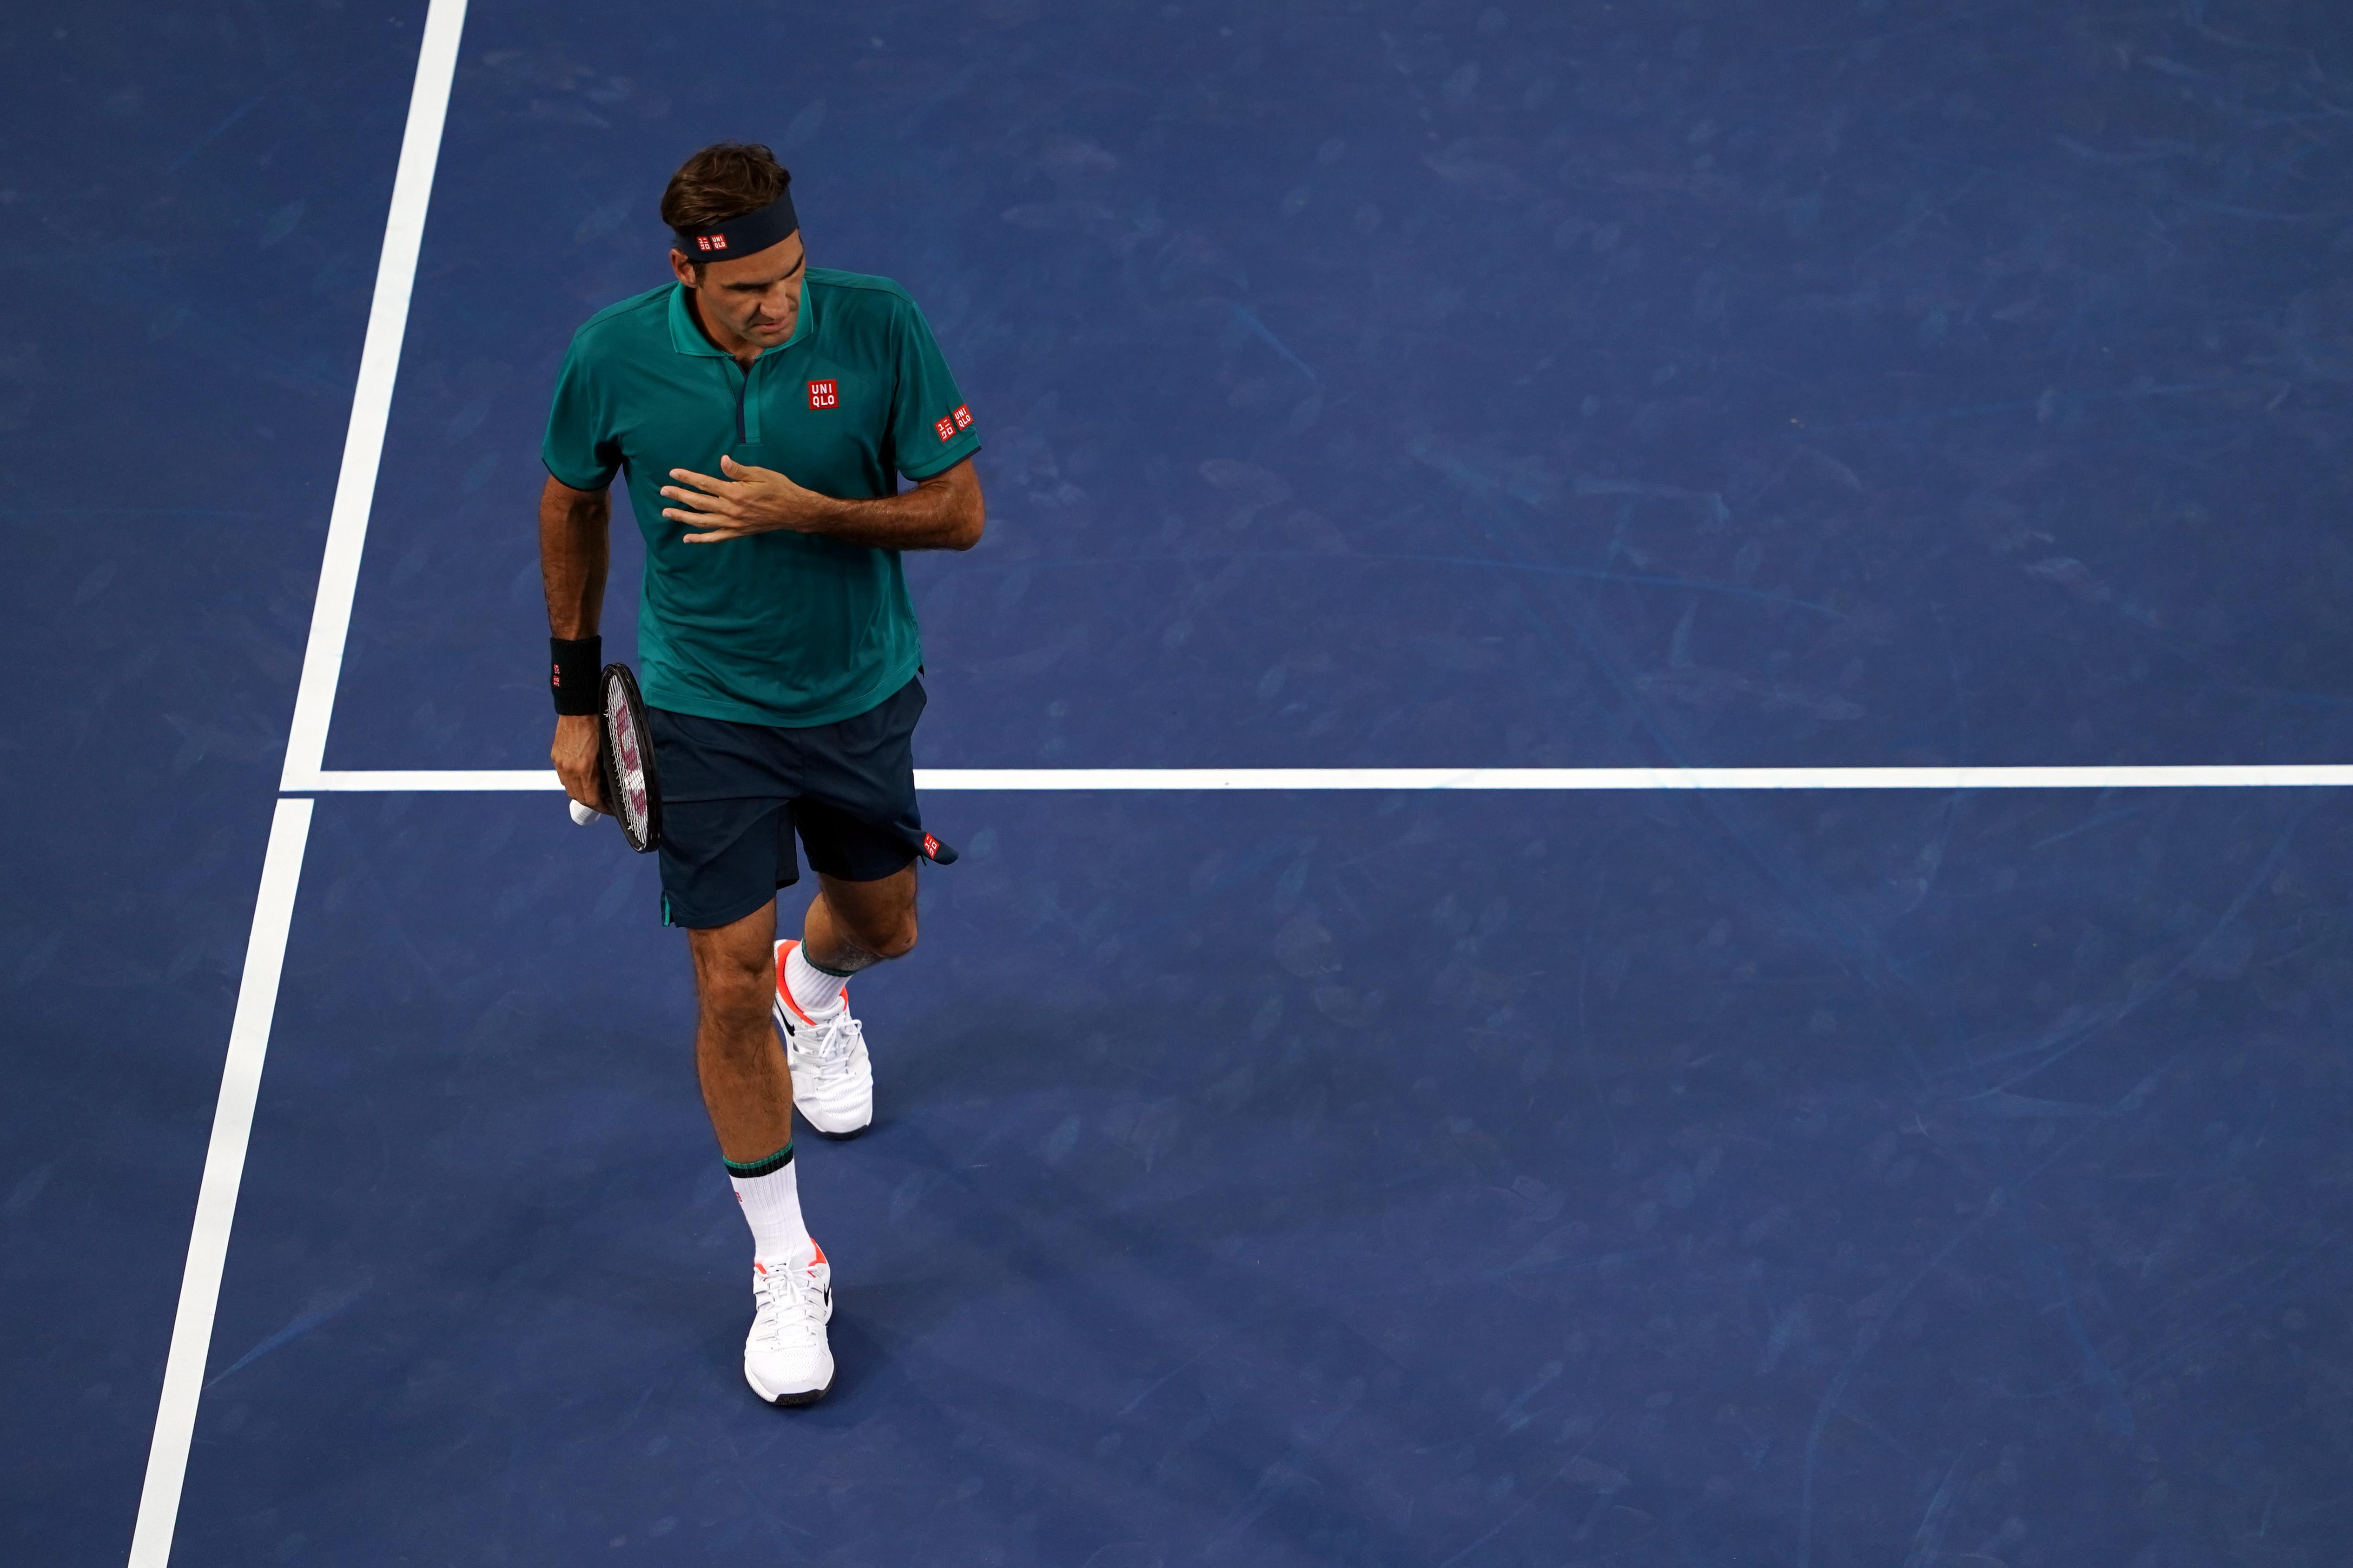 Ivan Ljubicic thinks more Slam laurels are in store for charge, Roger Federer